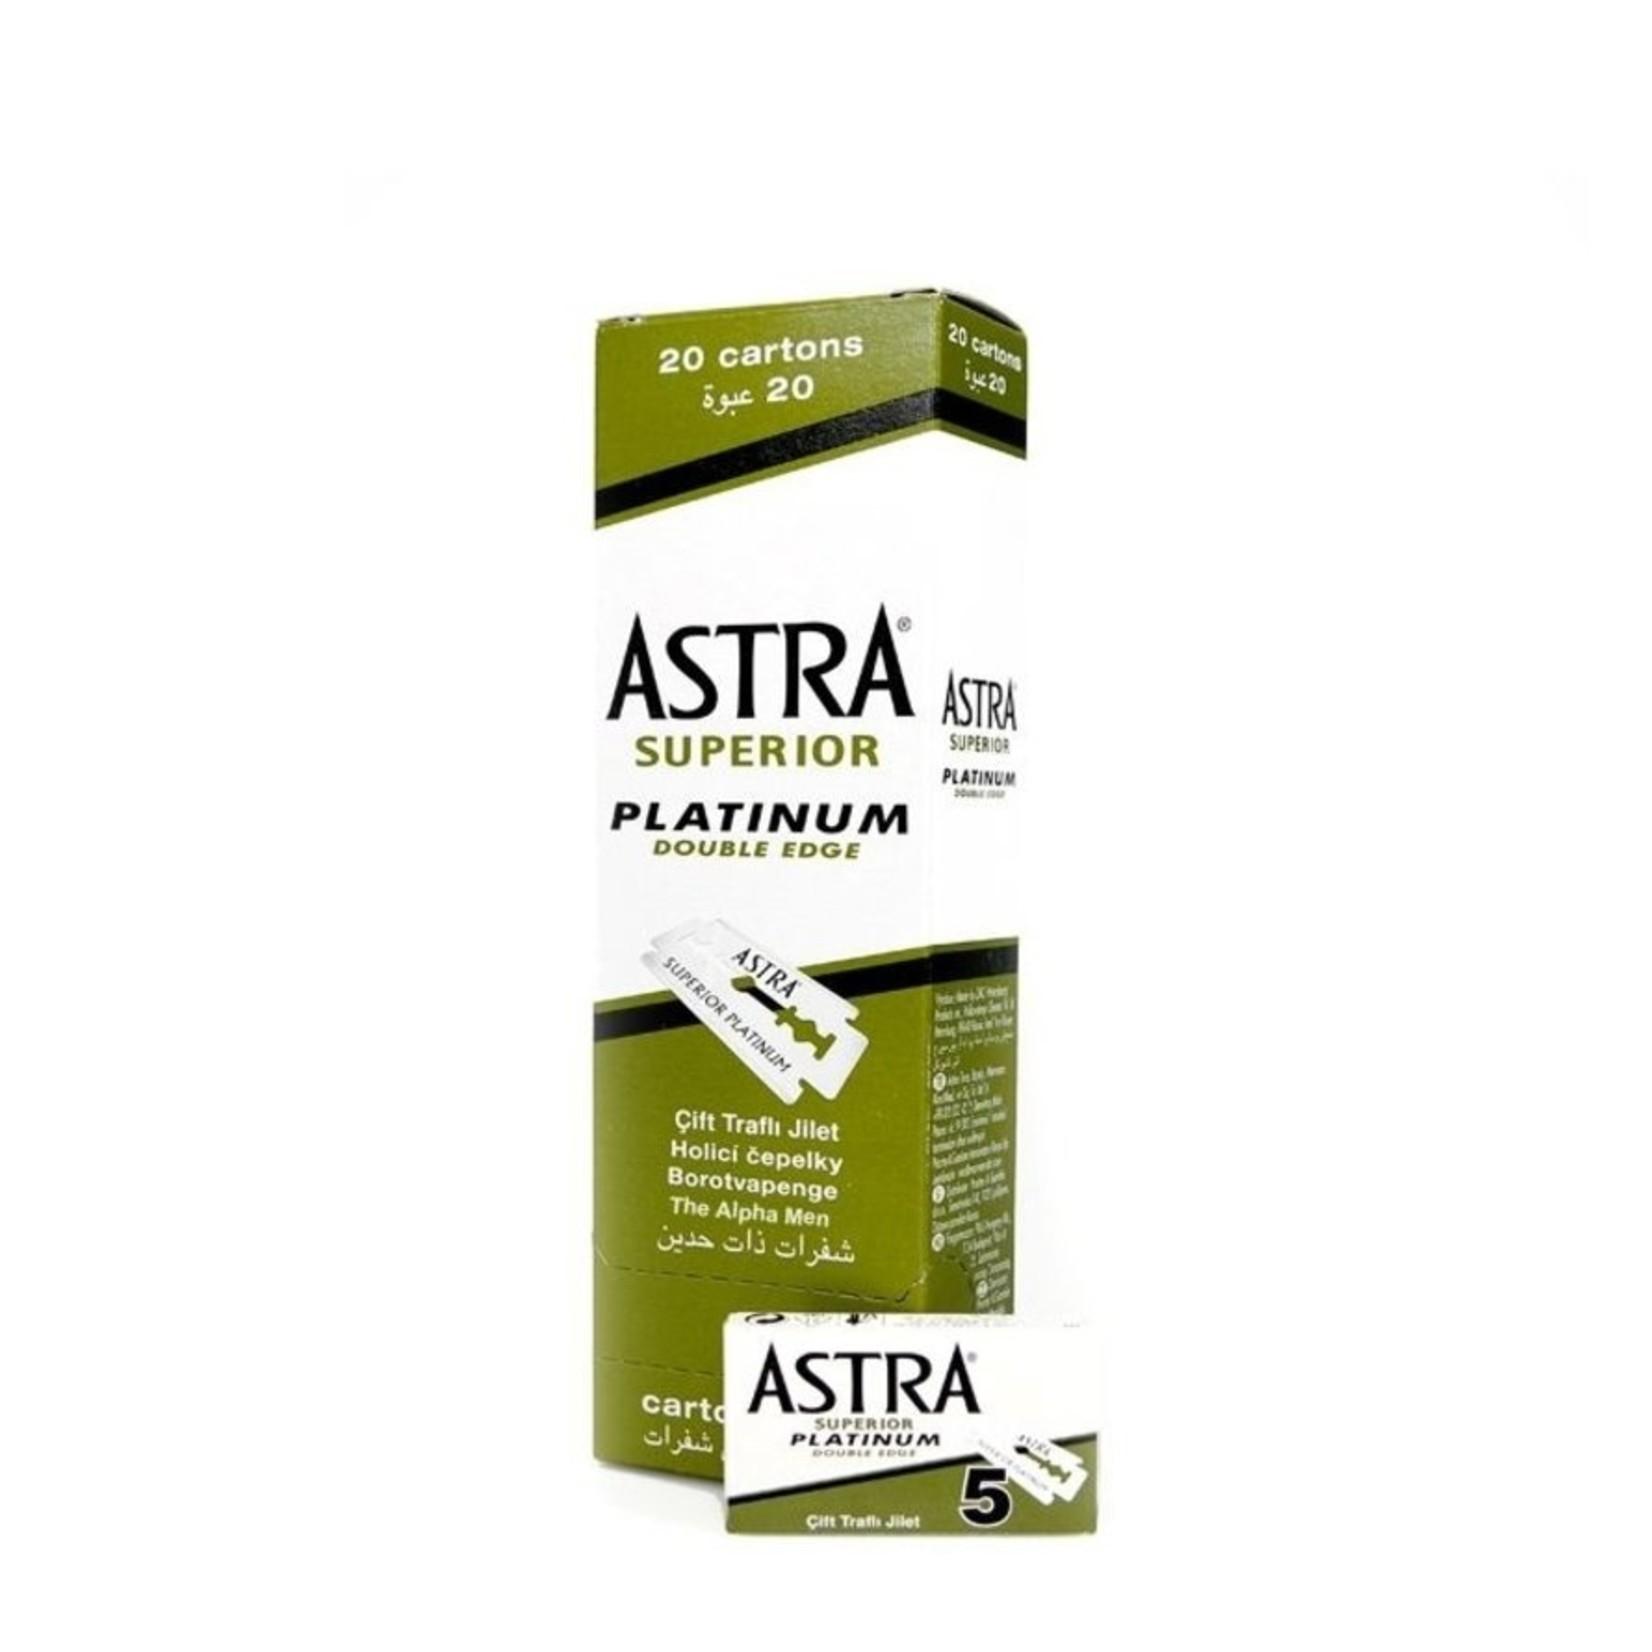 Astra Razor Blades